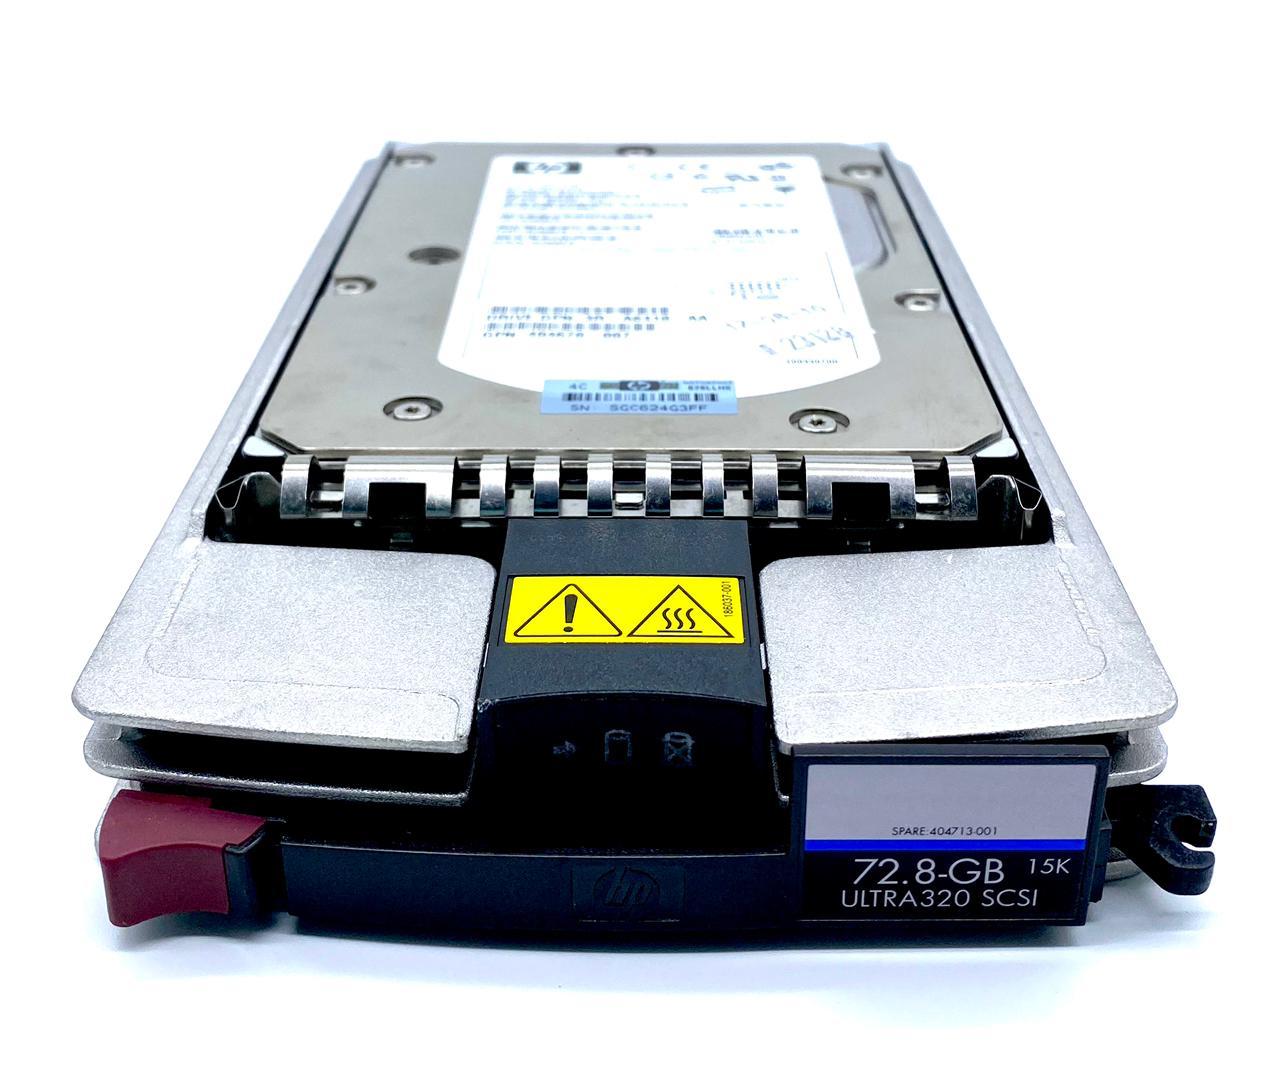 HD 72,8GB BF0728A4CB WIDE ULTRA 320 HP